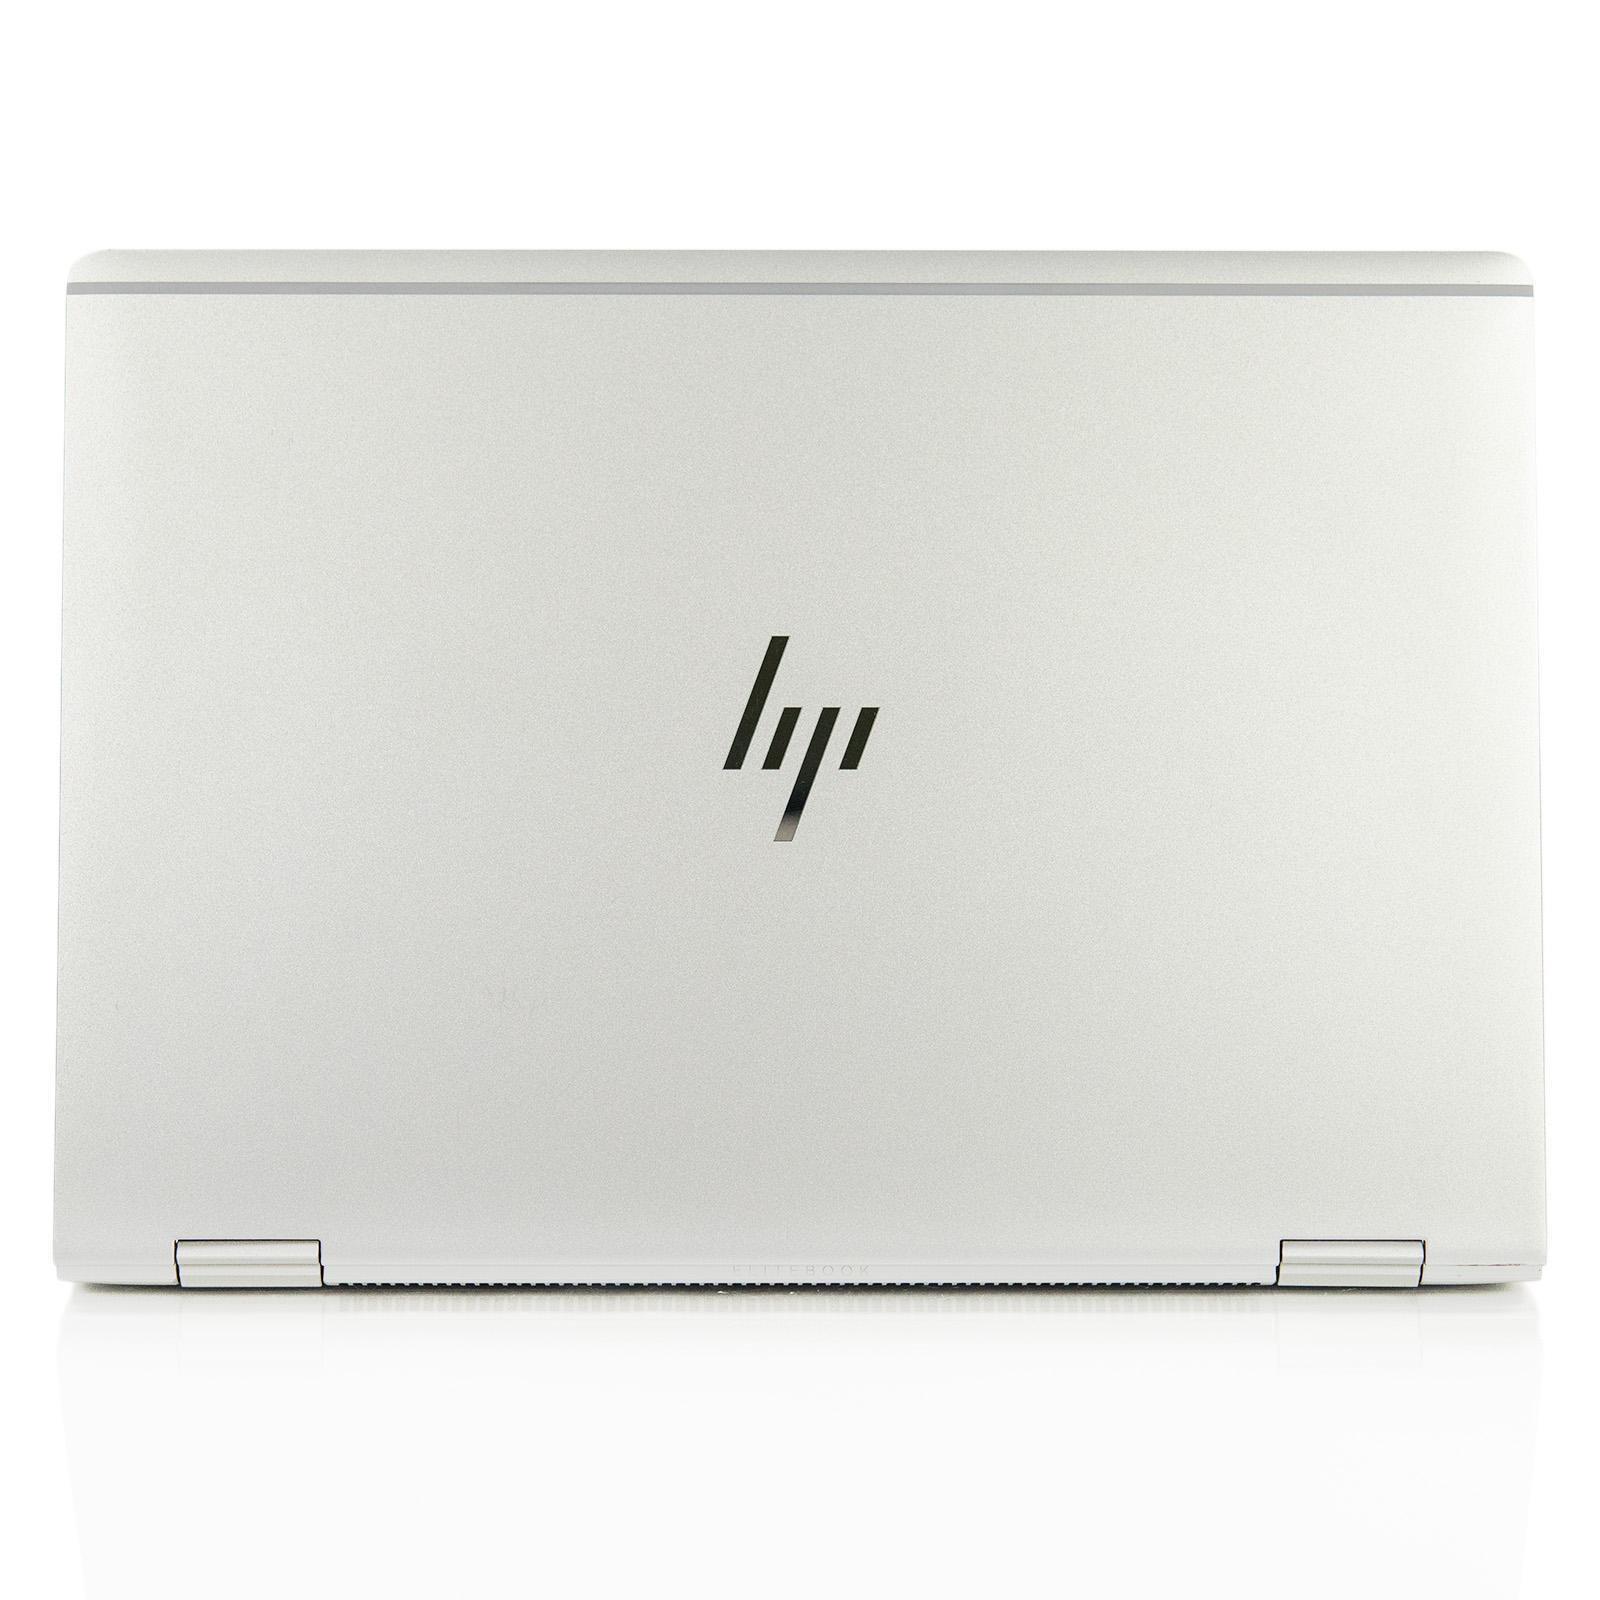 Hp EliteBook x360 1030 G2 13.3-inch (2017) - Core i7-7600U - 8 GB - HDD 512 GB